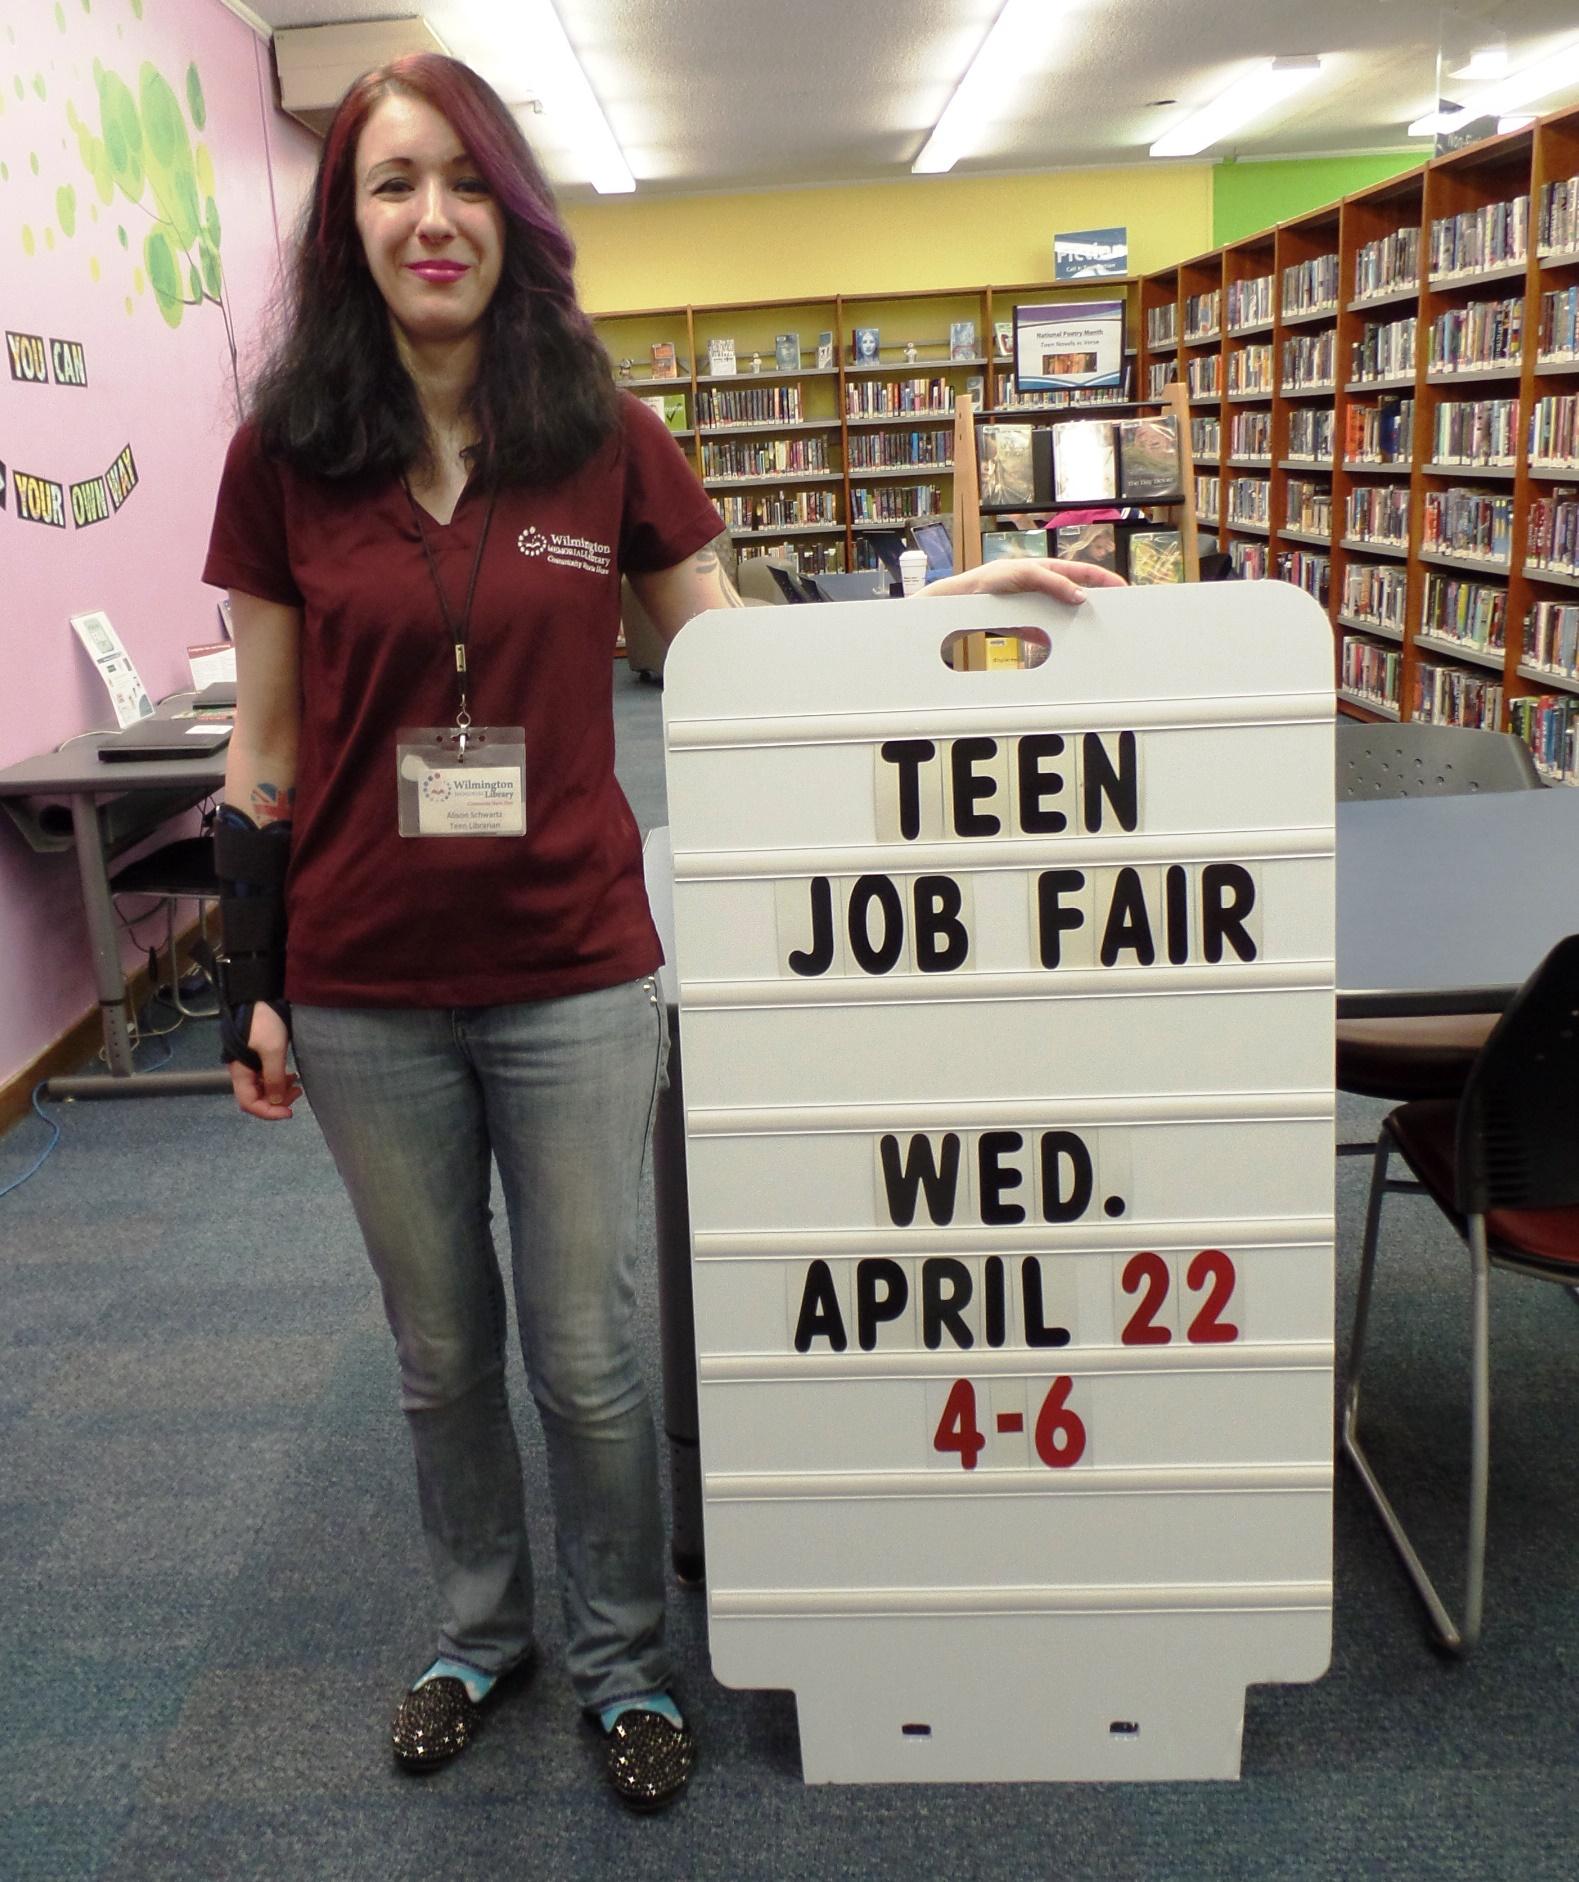 teen librarian alison schwartz promoting the librarys teen job fair